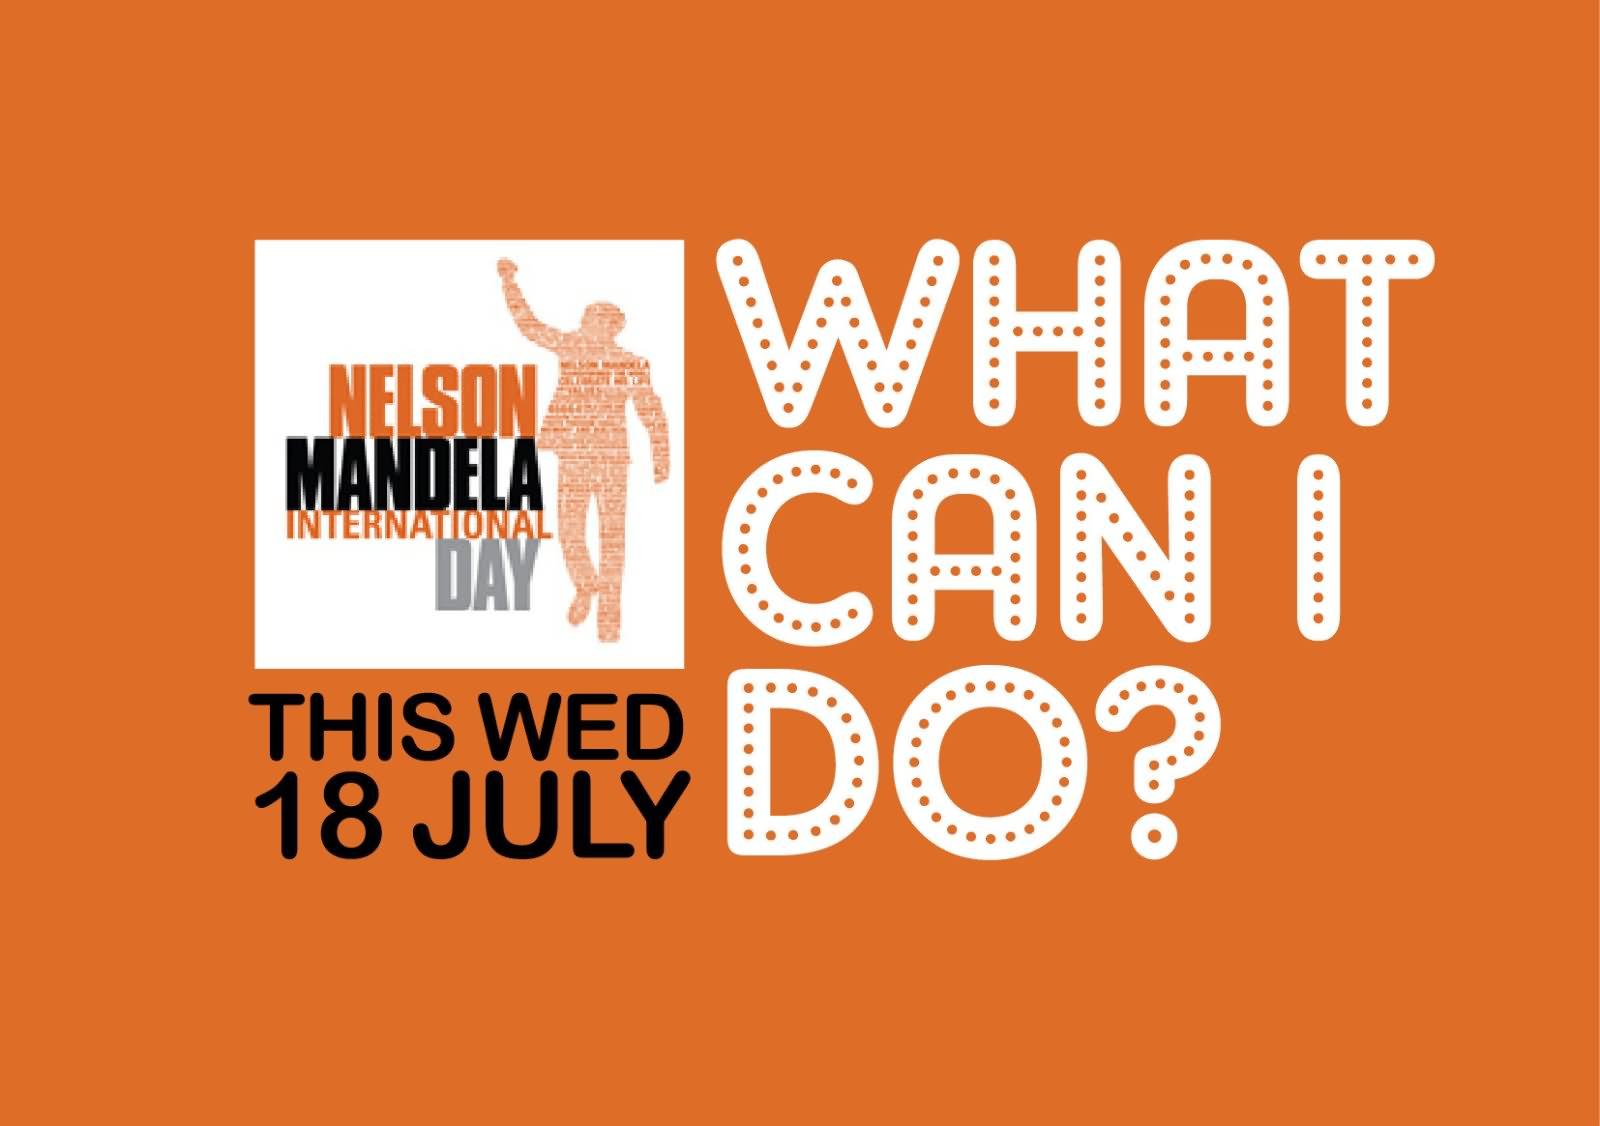 Nelson mandela international day 18 july picture